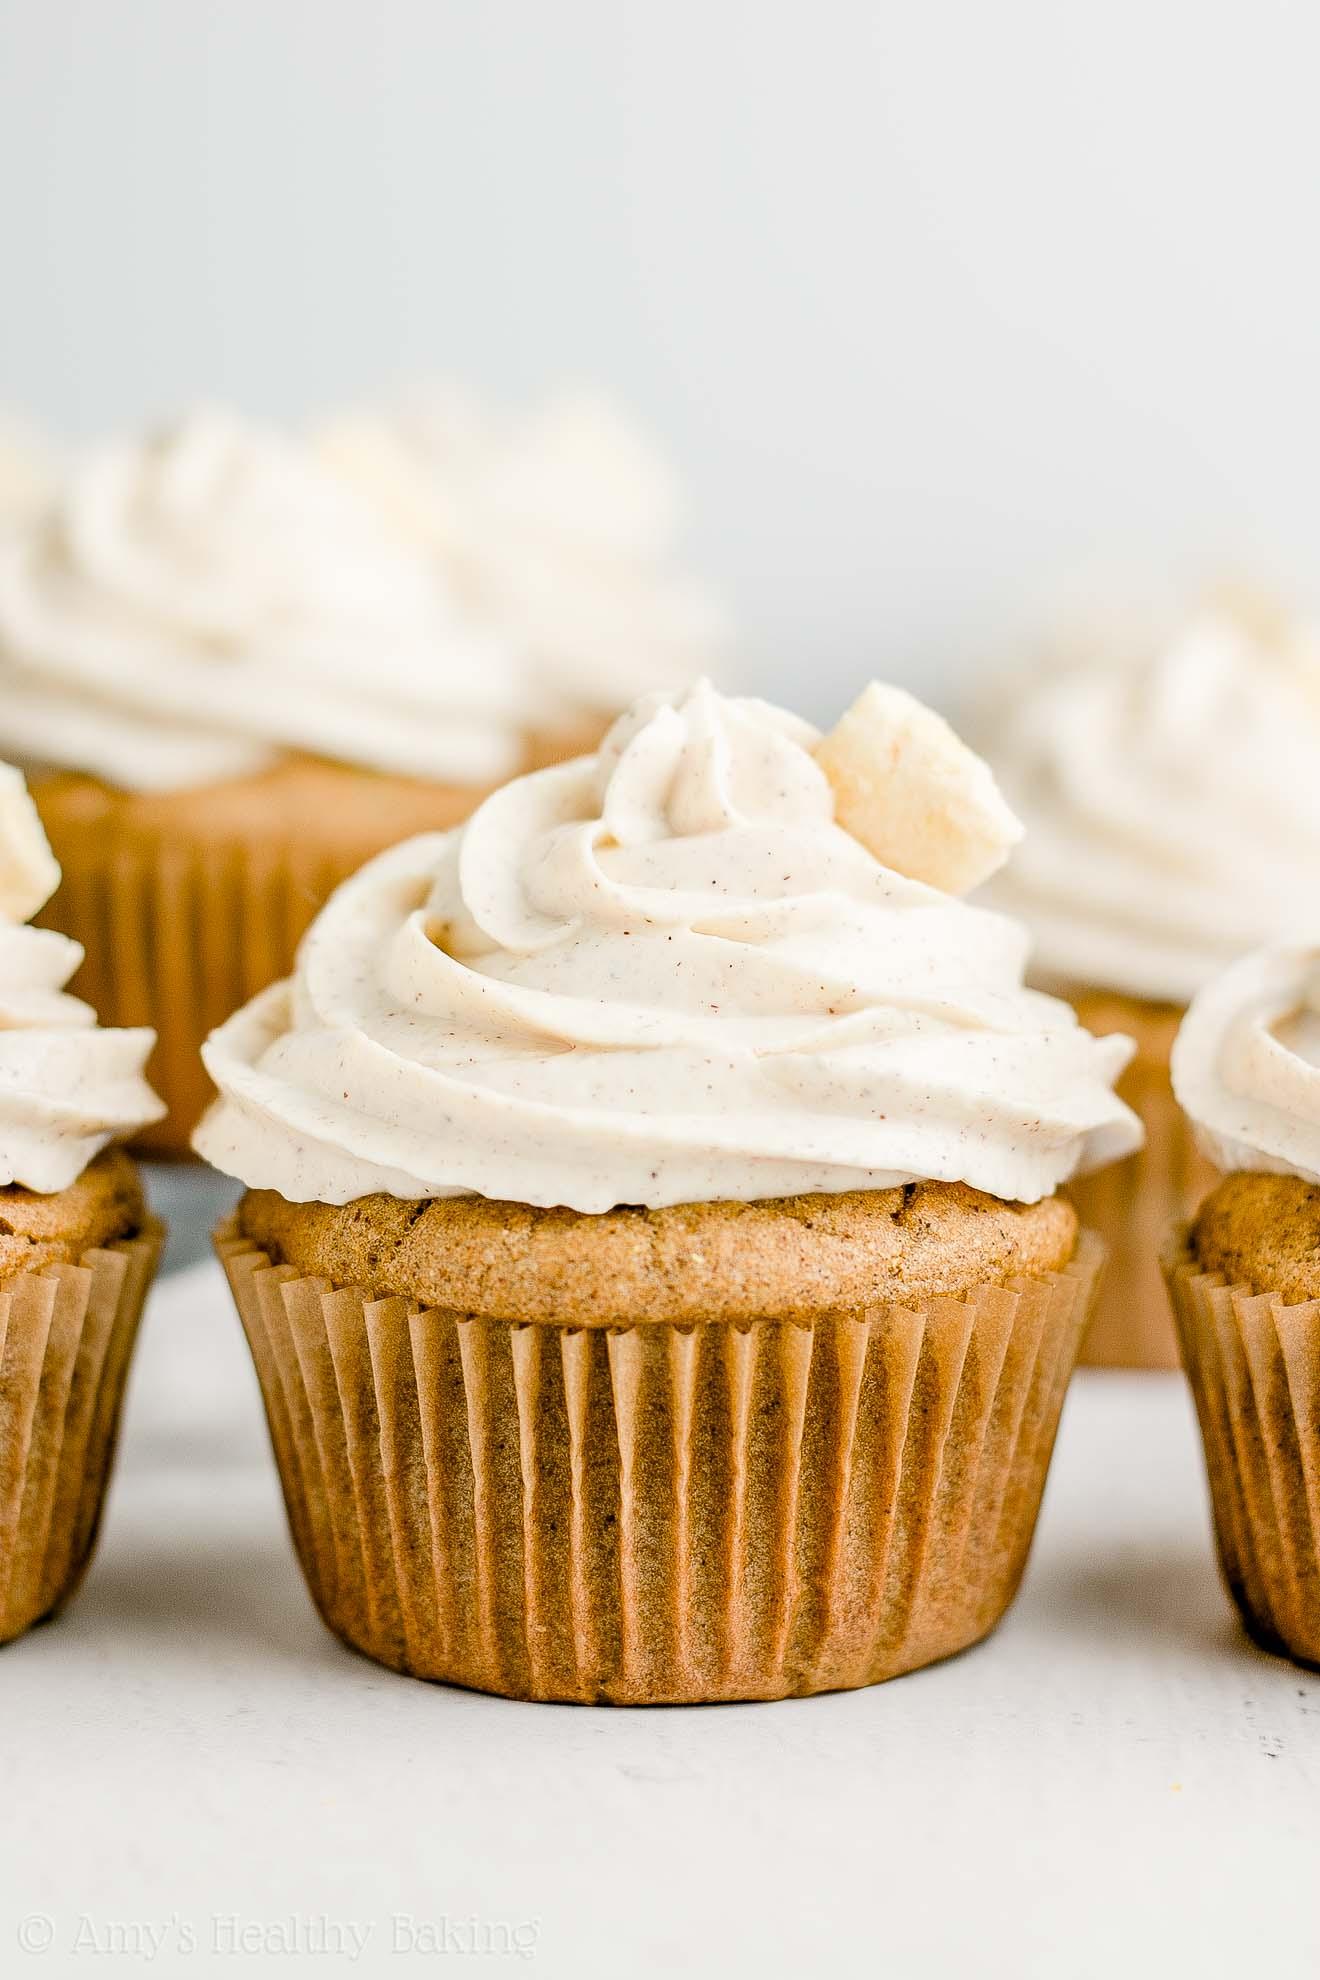 Best Healthy Moist Cinnamon Apple Cupcakes with Cinnamon Frosting